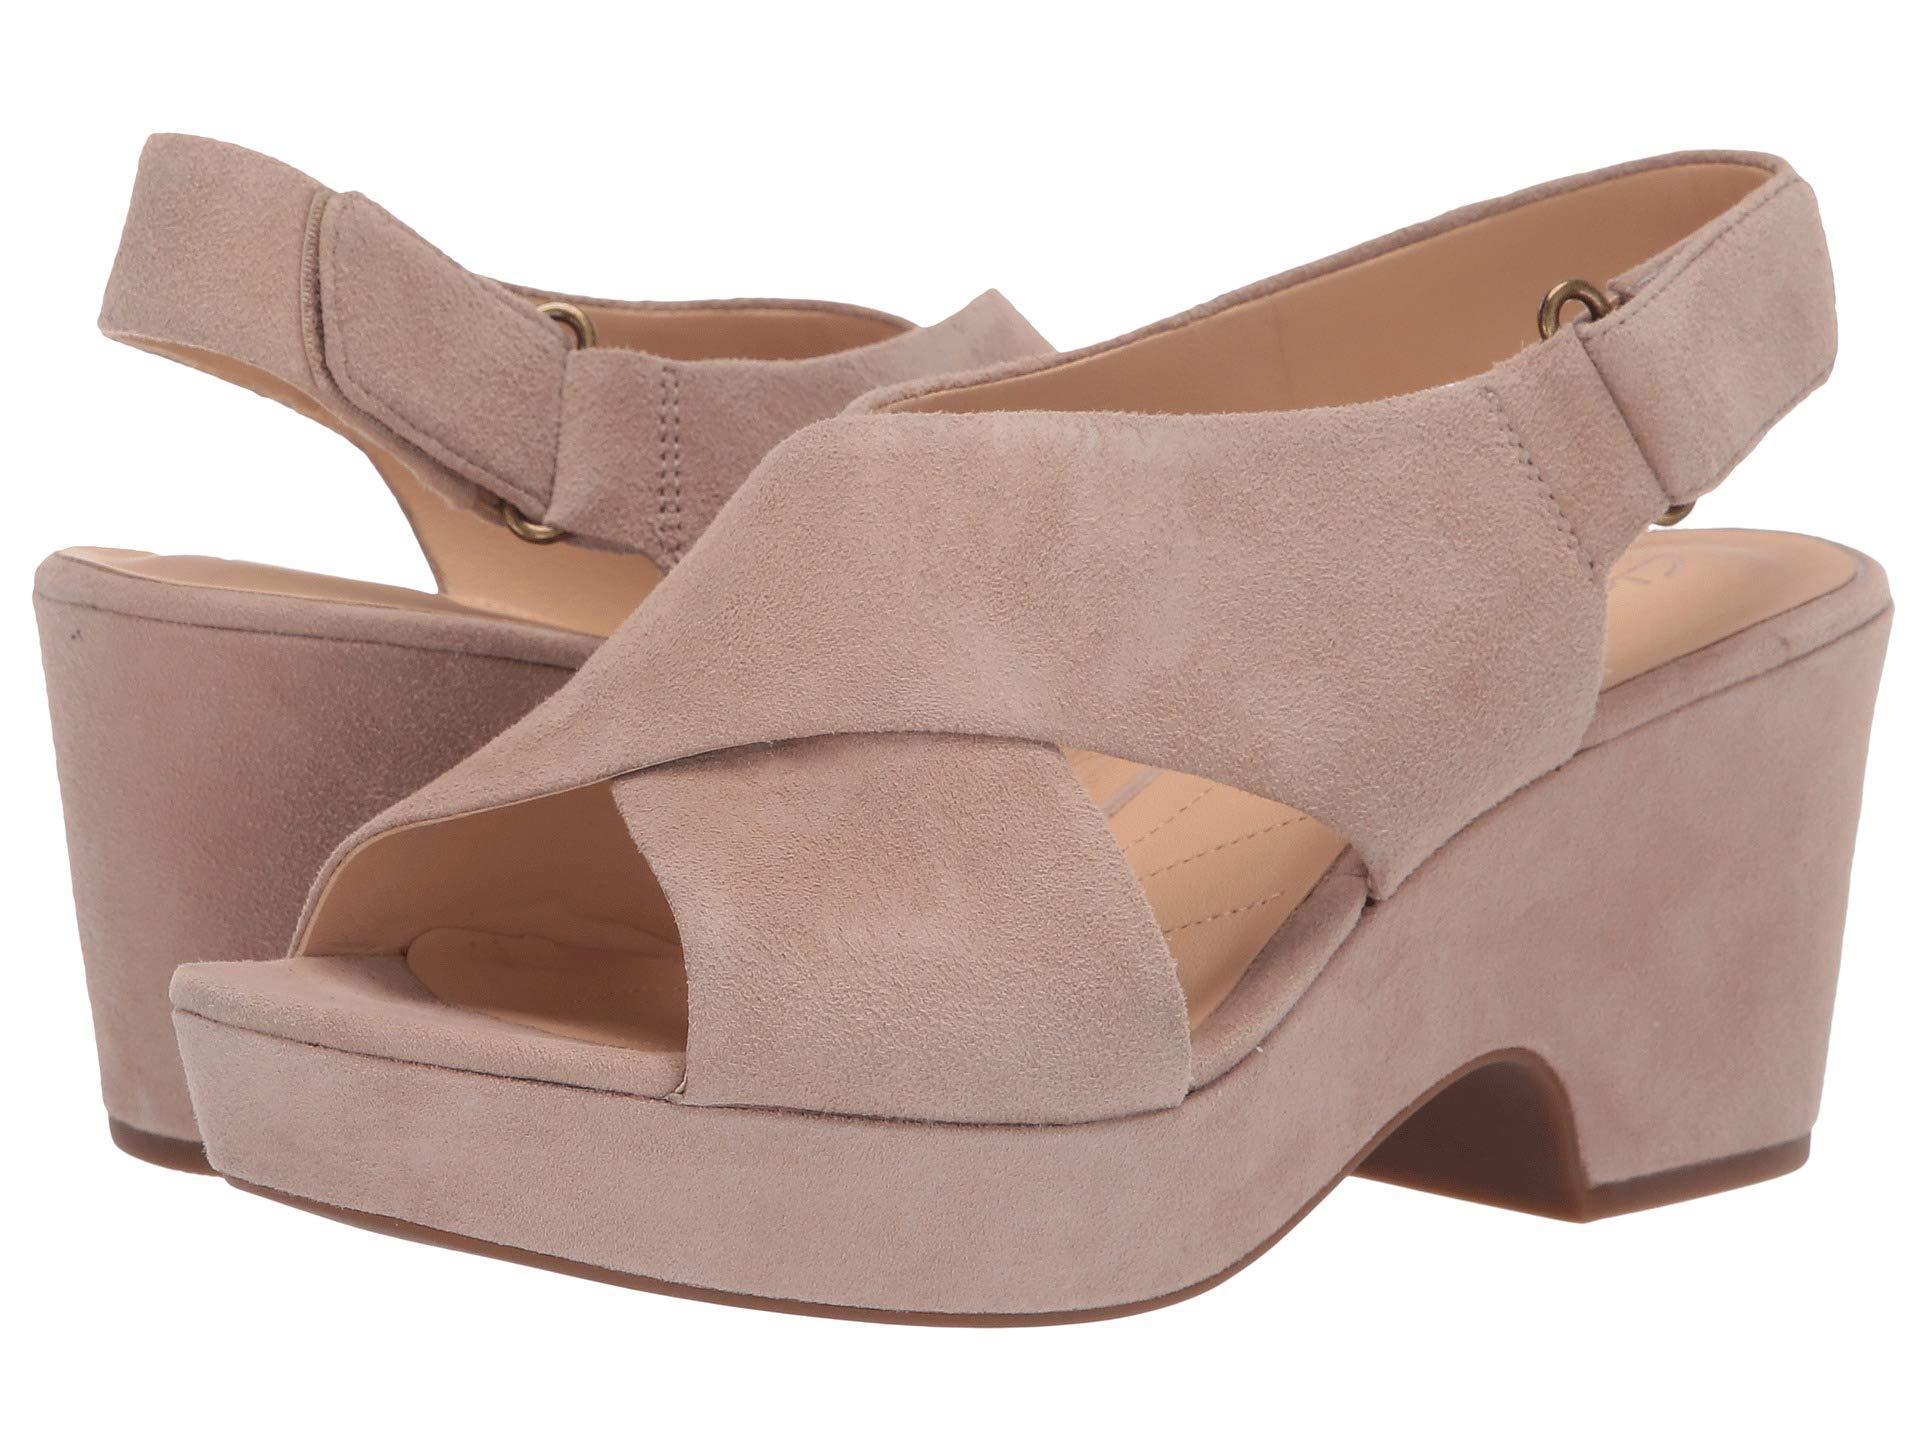 91300cf9e855 Lyst - Clarks Maritsa Lara (sand Suede) Women s Wedge Shoes in Natural